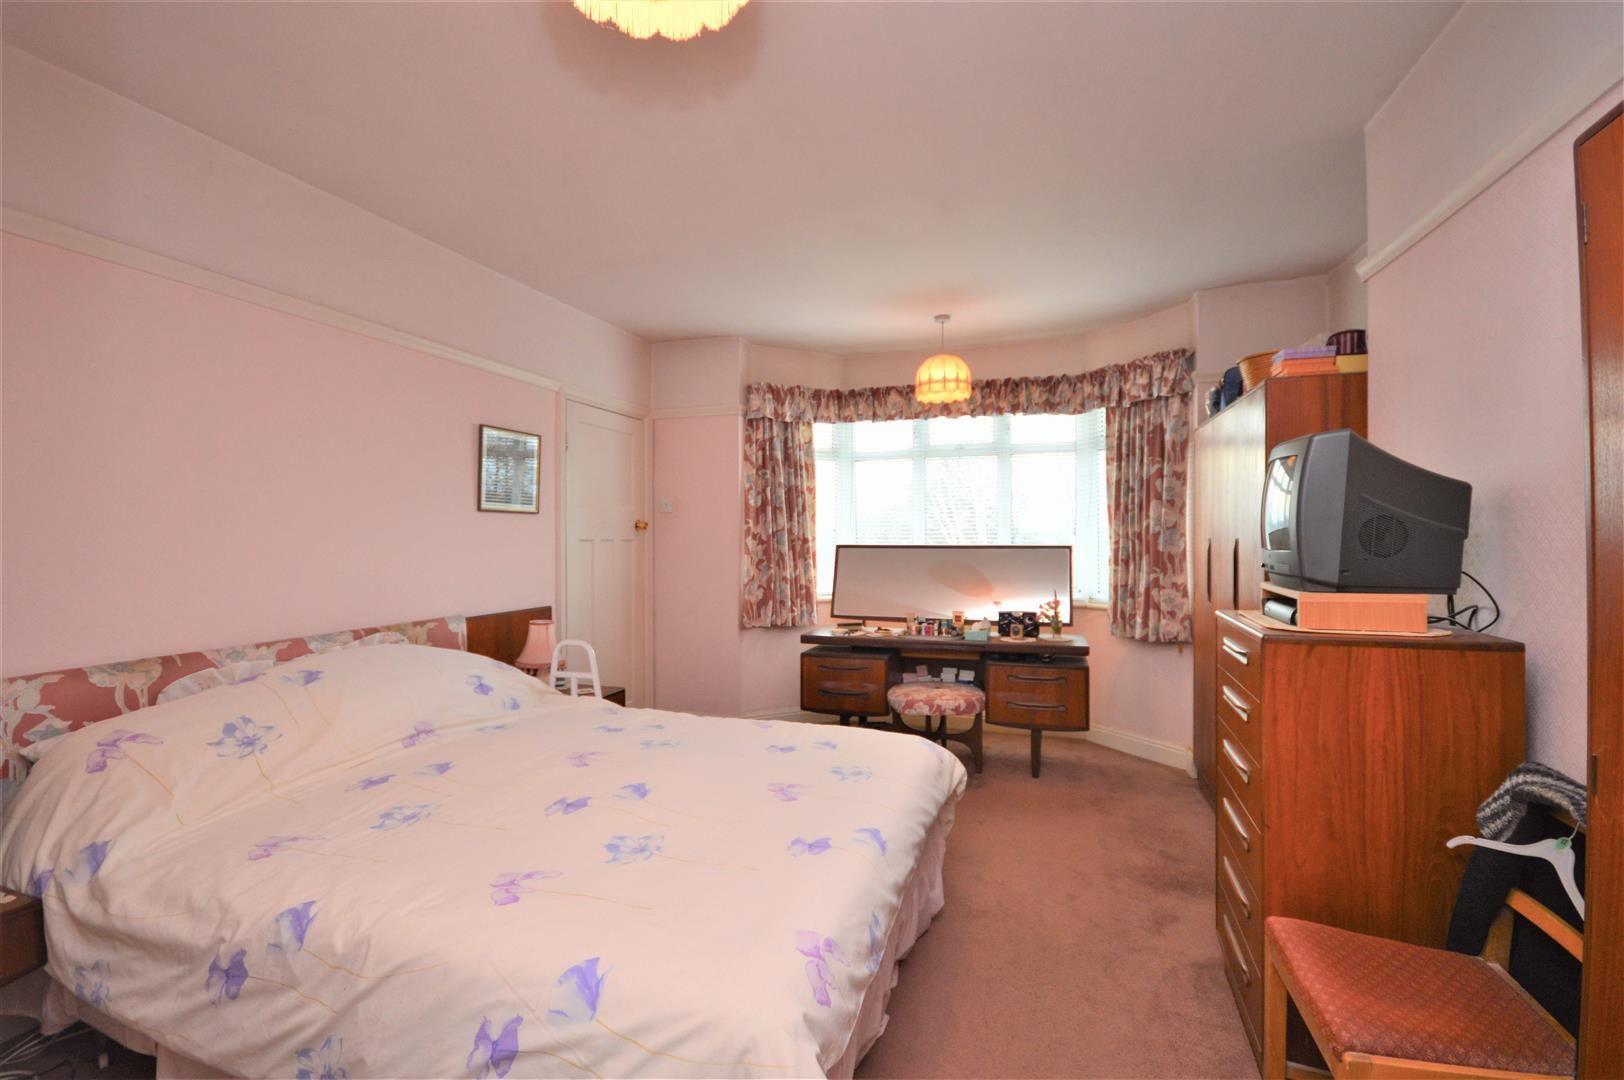 4 bed detached for sale in Bobblestock 12